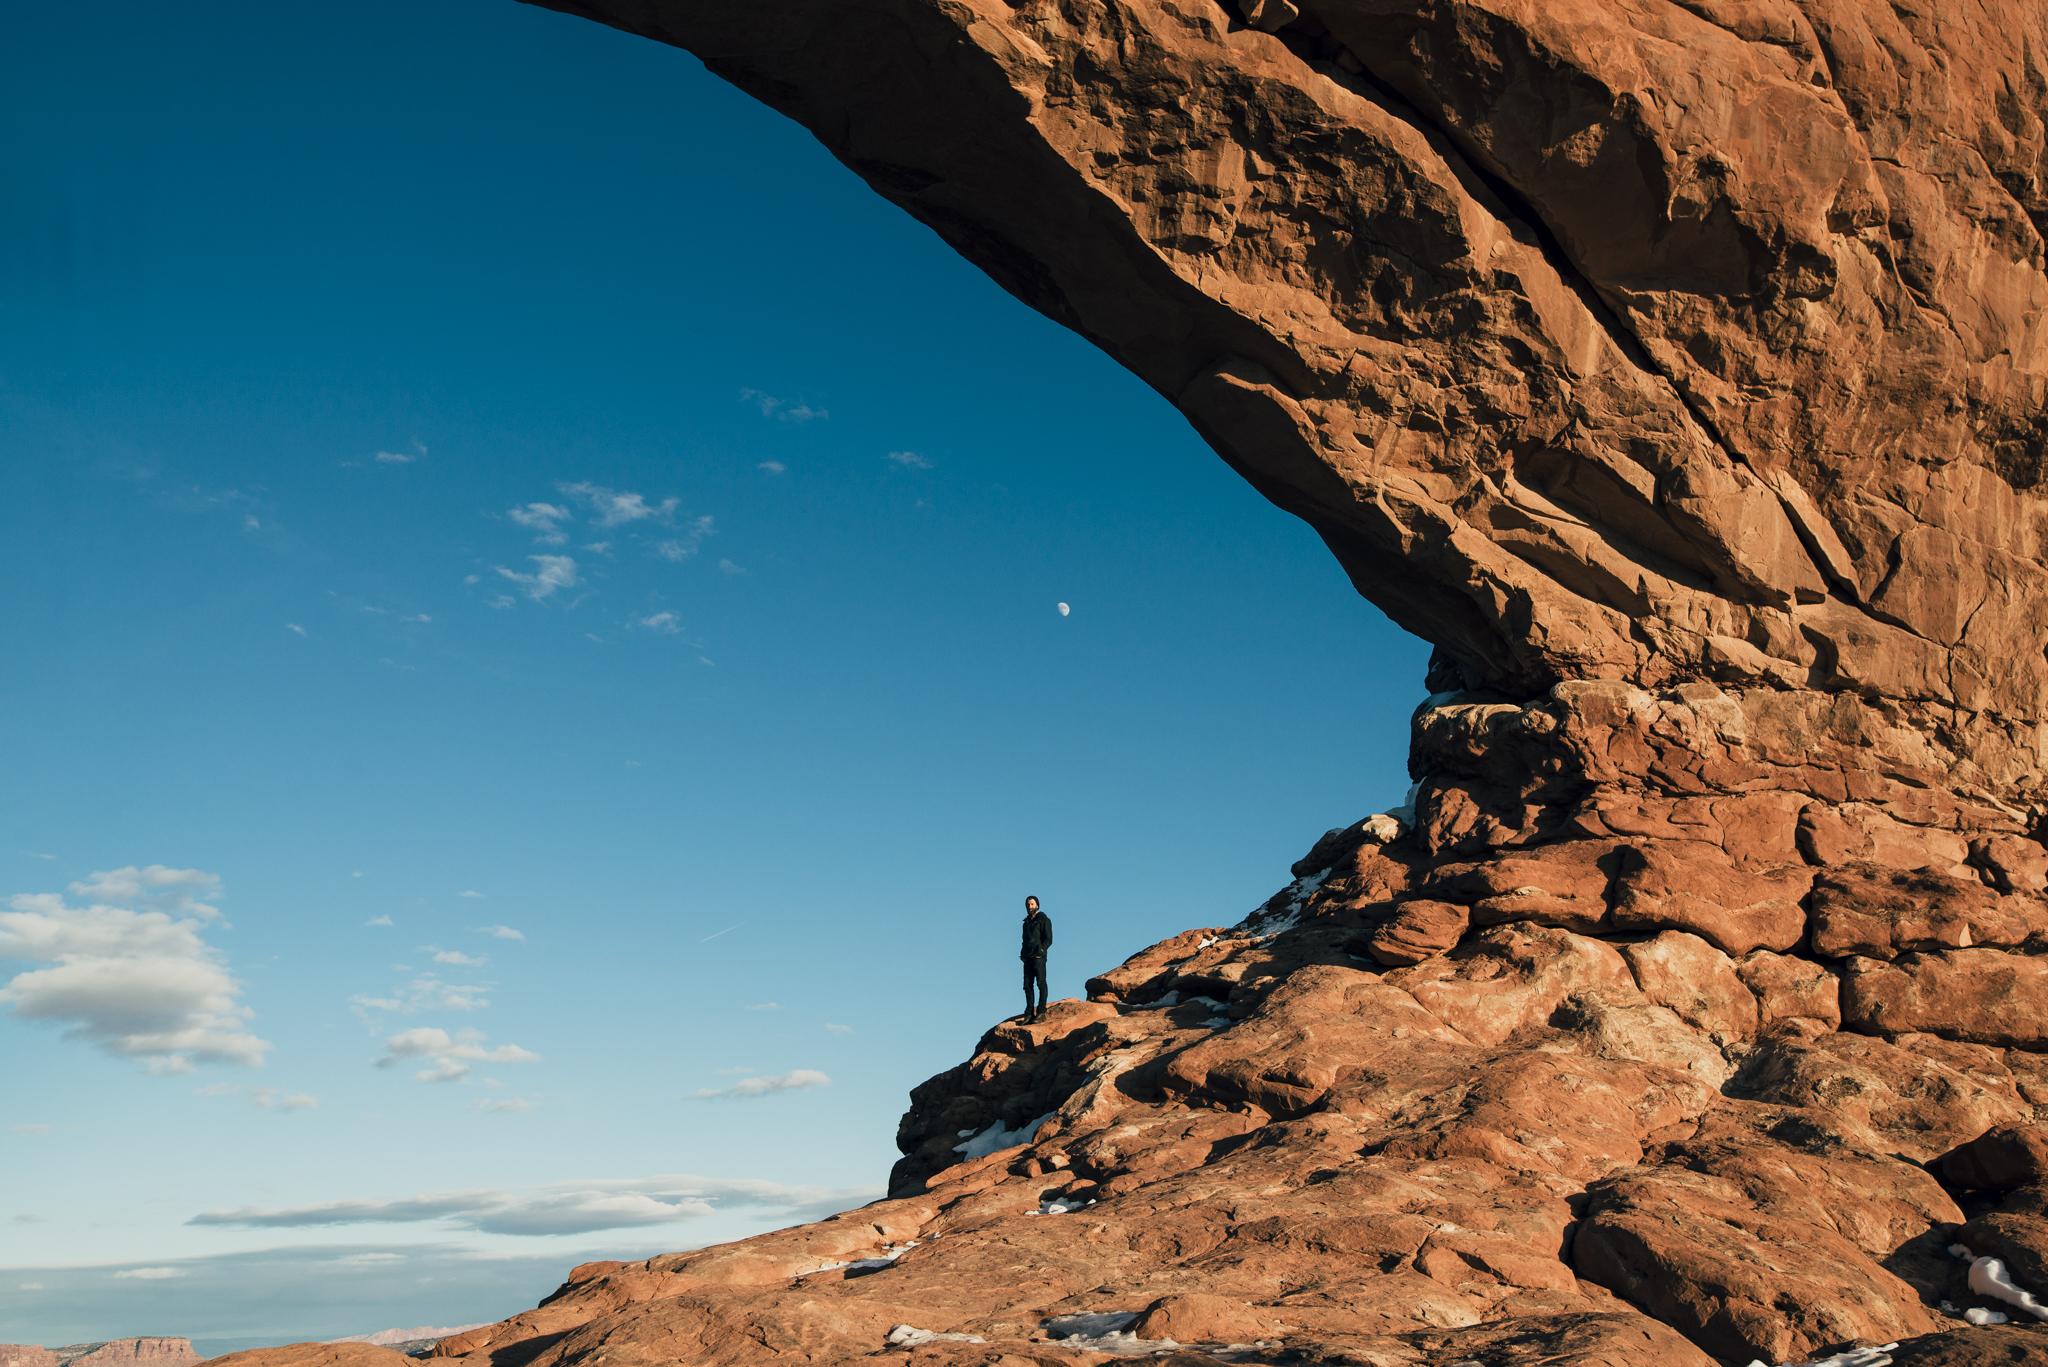 Isaiah-&-Taylor-Photography---White-Sand-Dunes-21.jpg